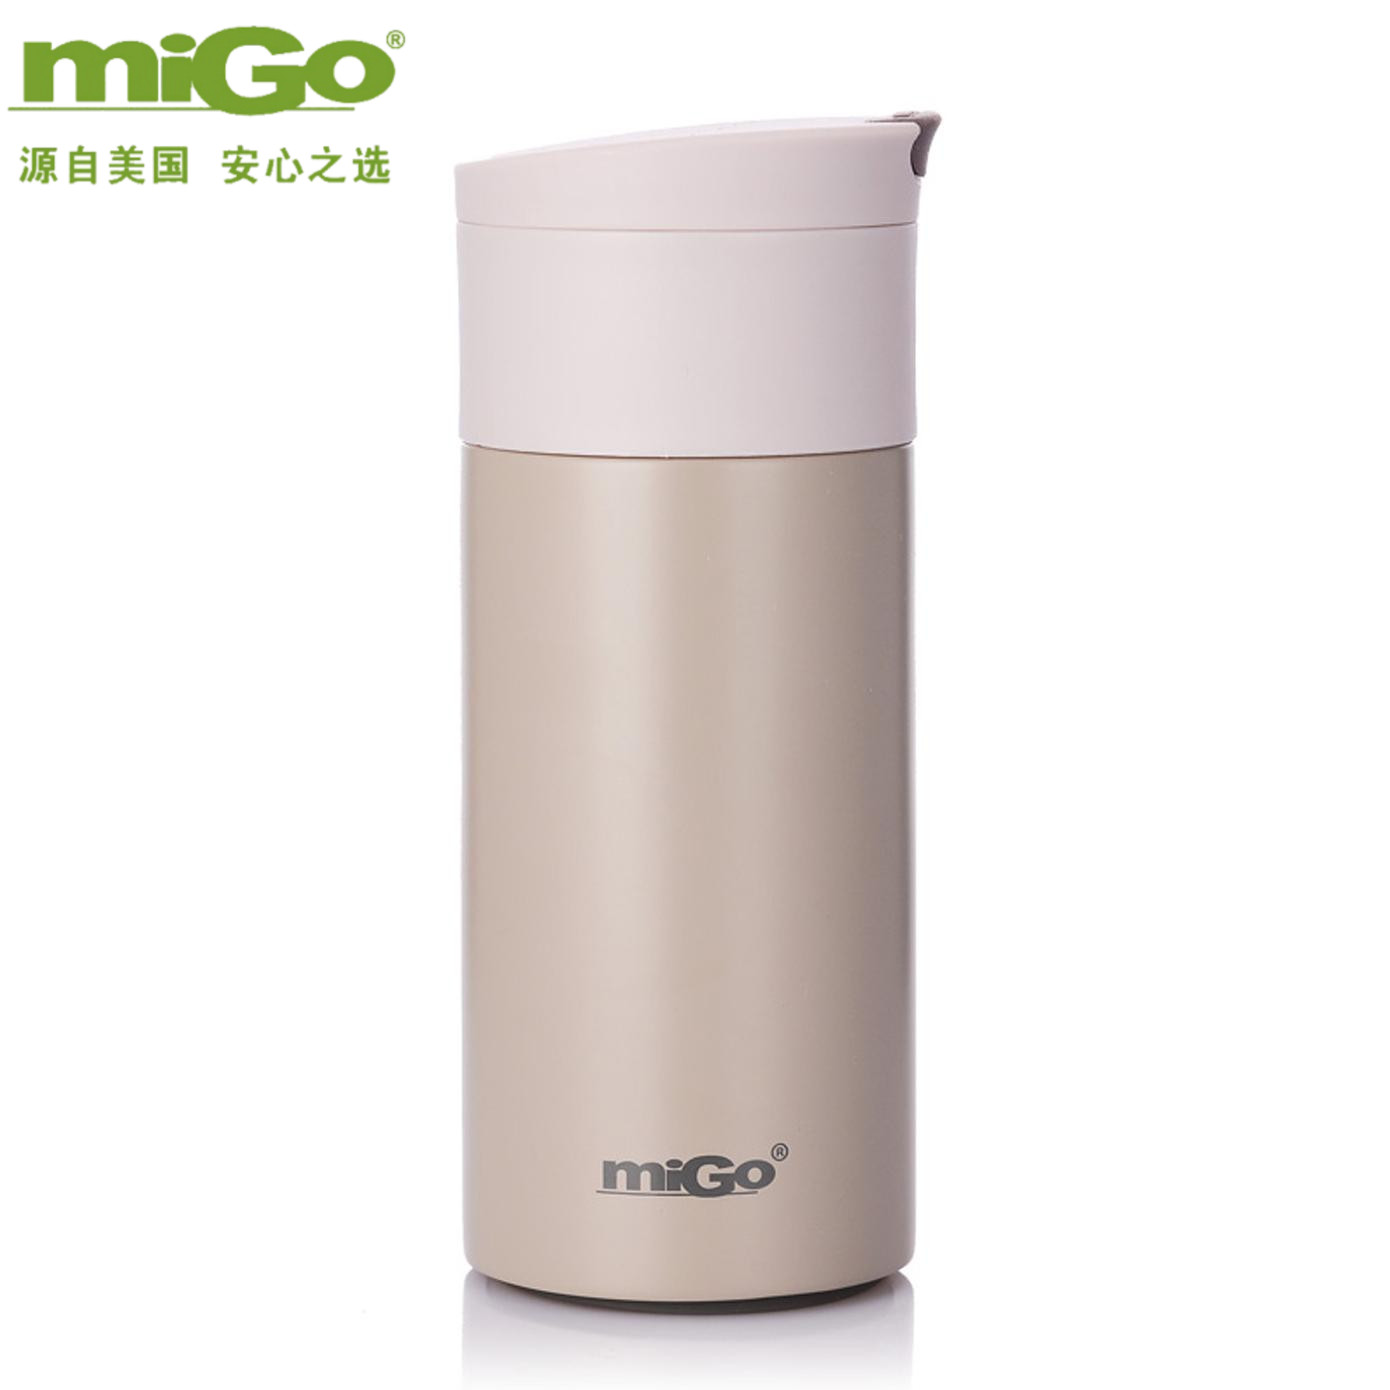 Термос/термочашка Migo 304 260ml термос для еды aladdin migo